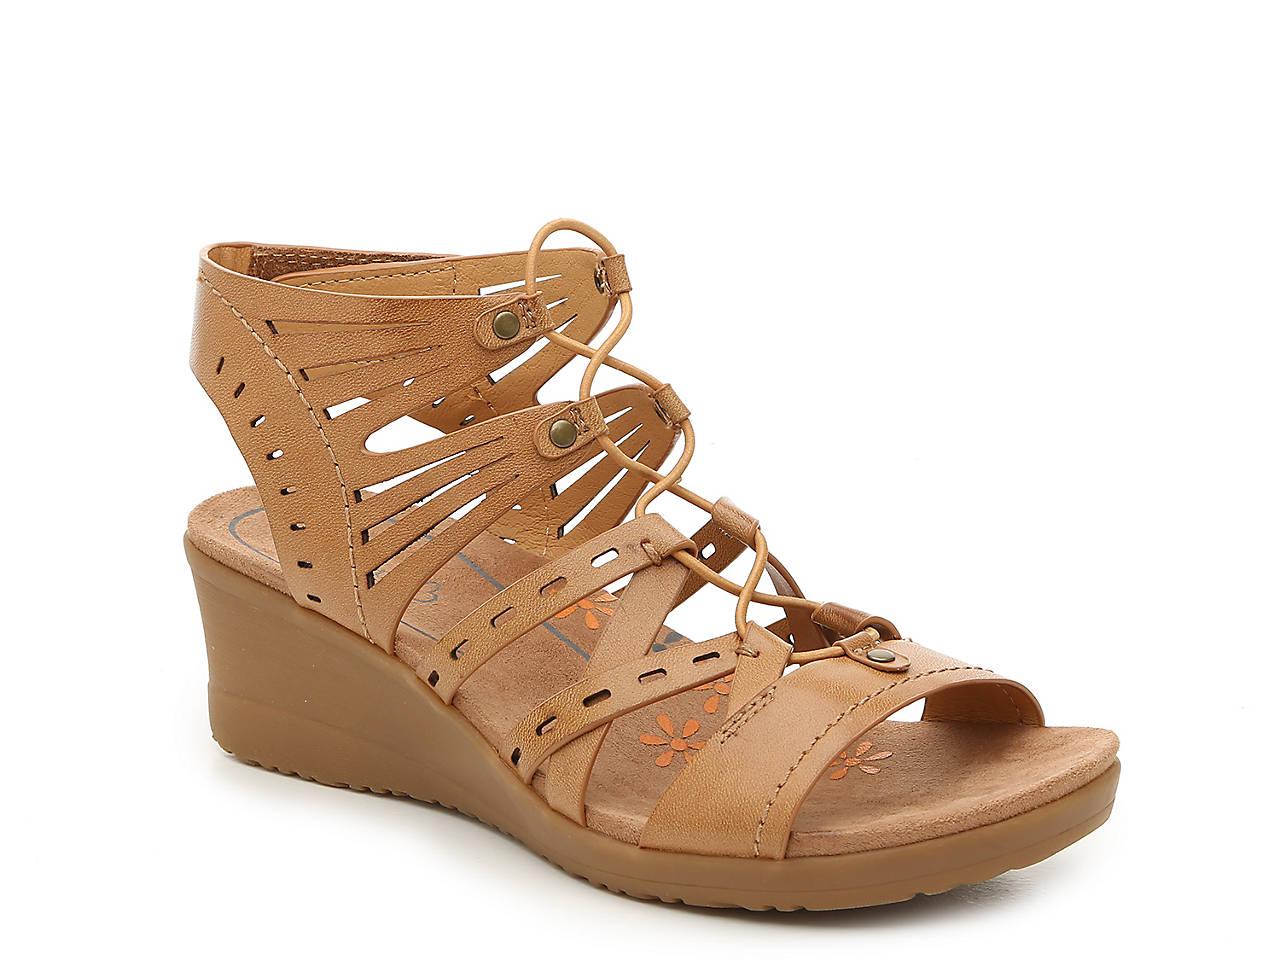 32ed637558 Bare Traps Tipton Wedge Sandal Women's Shoes   DSW